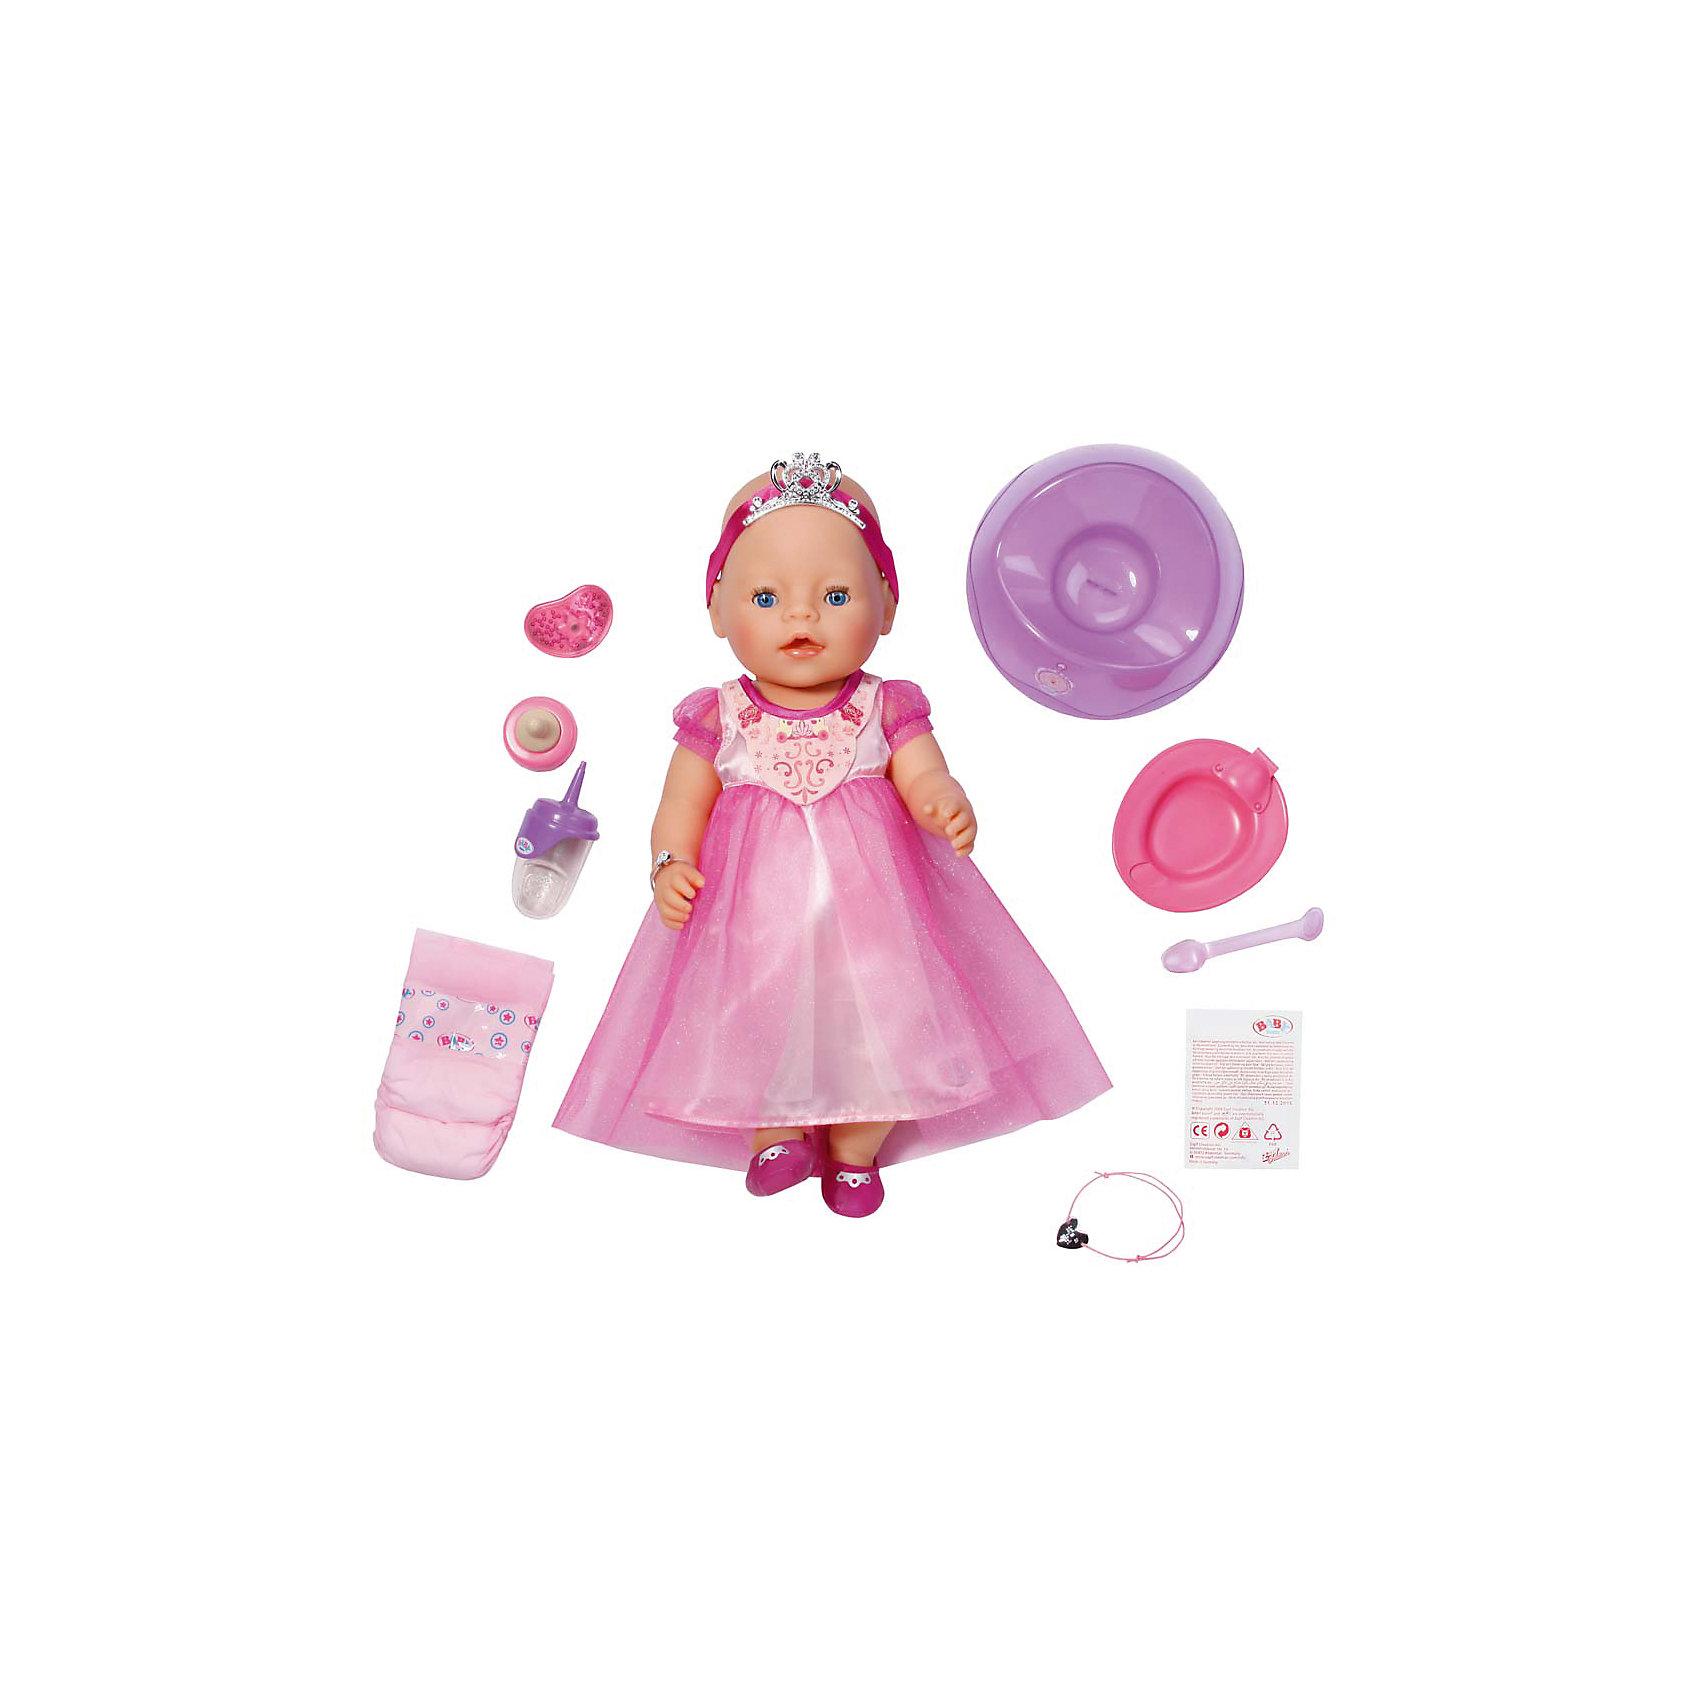 Интерактивная кукла Принцесса, 43 см,  BABY born